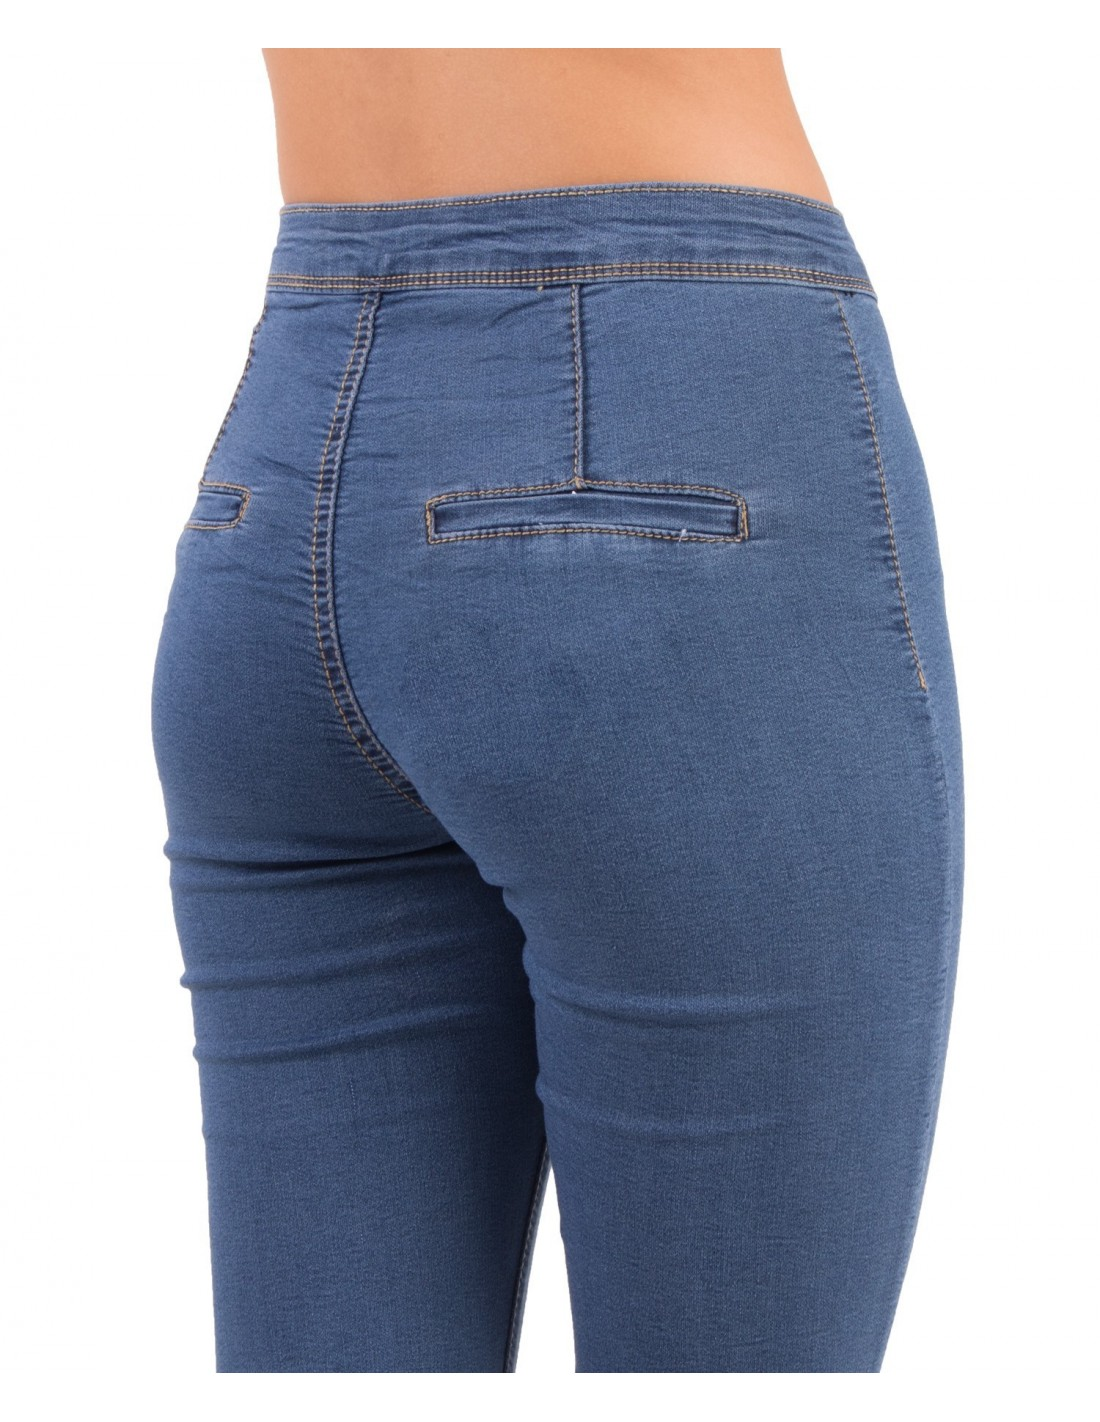 Jean femme skinny taille haute bleu jean stretch effet gainant bleu b9d41385bffd